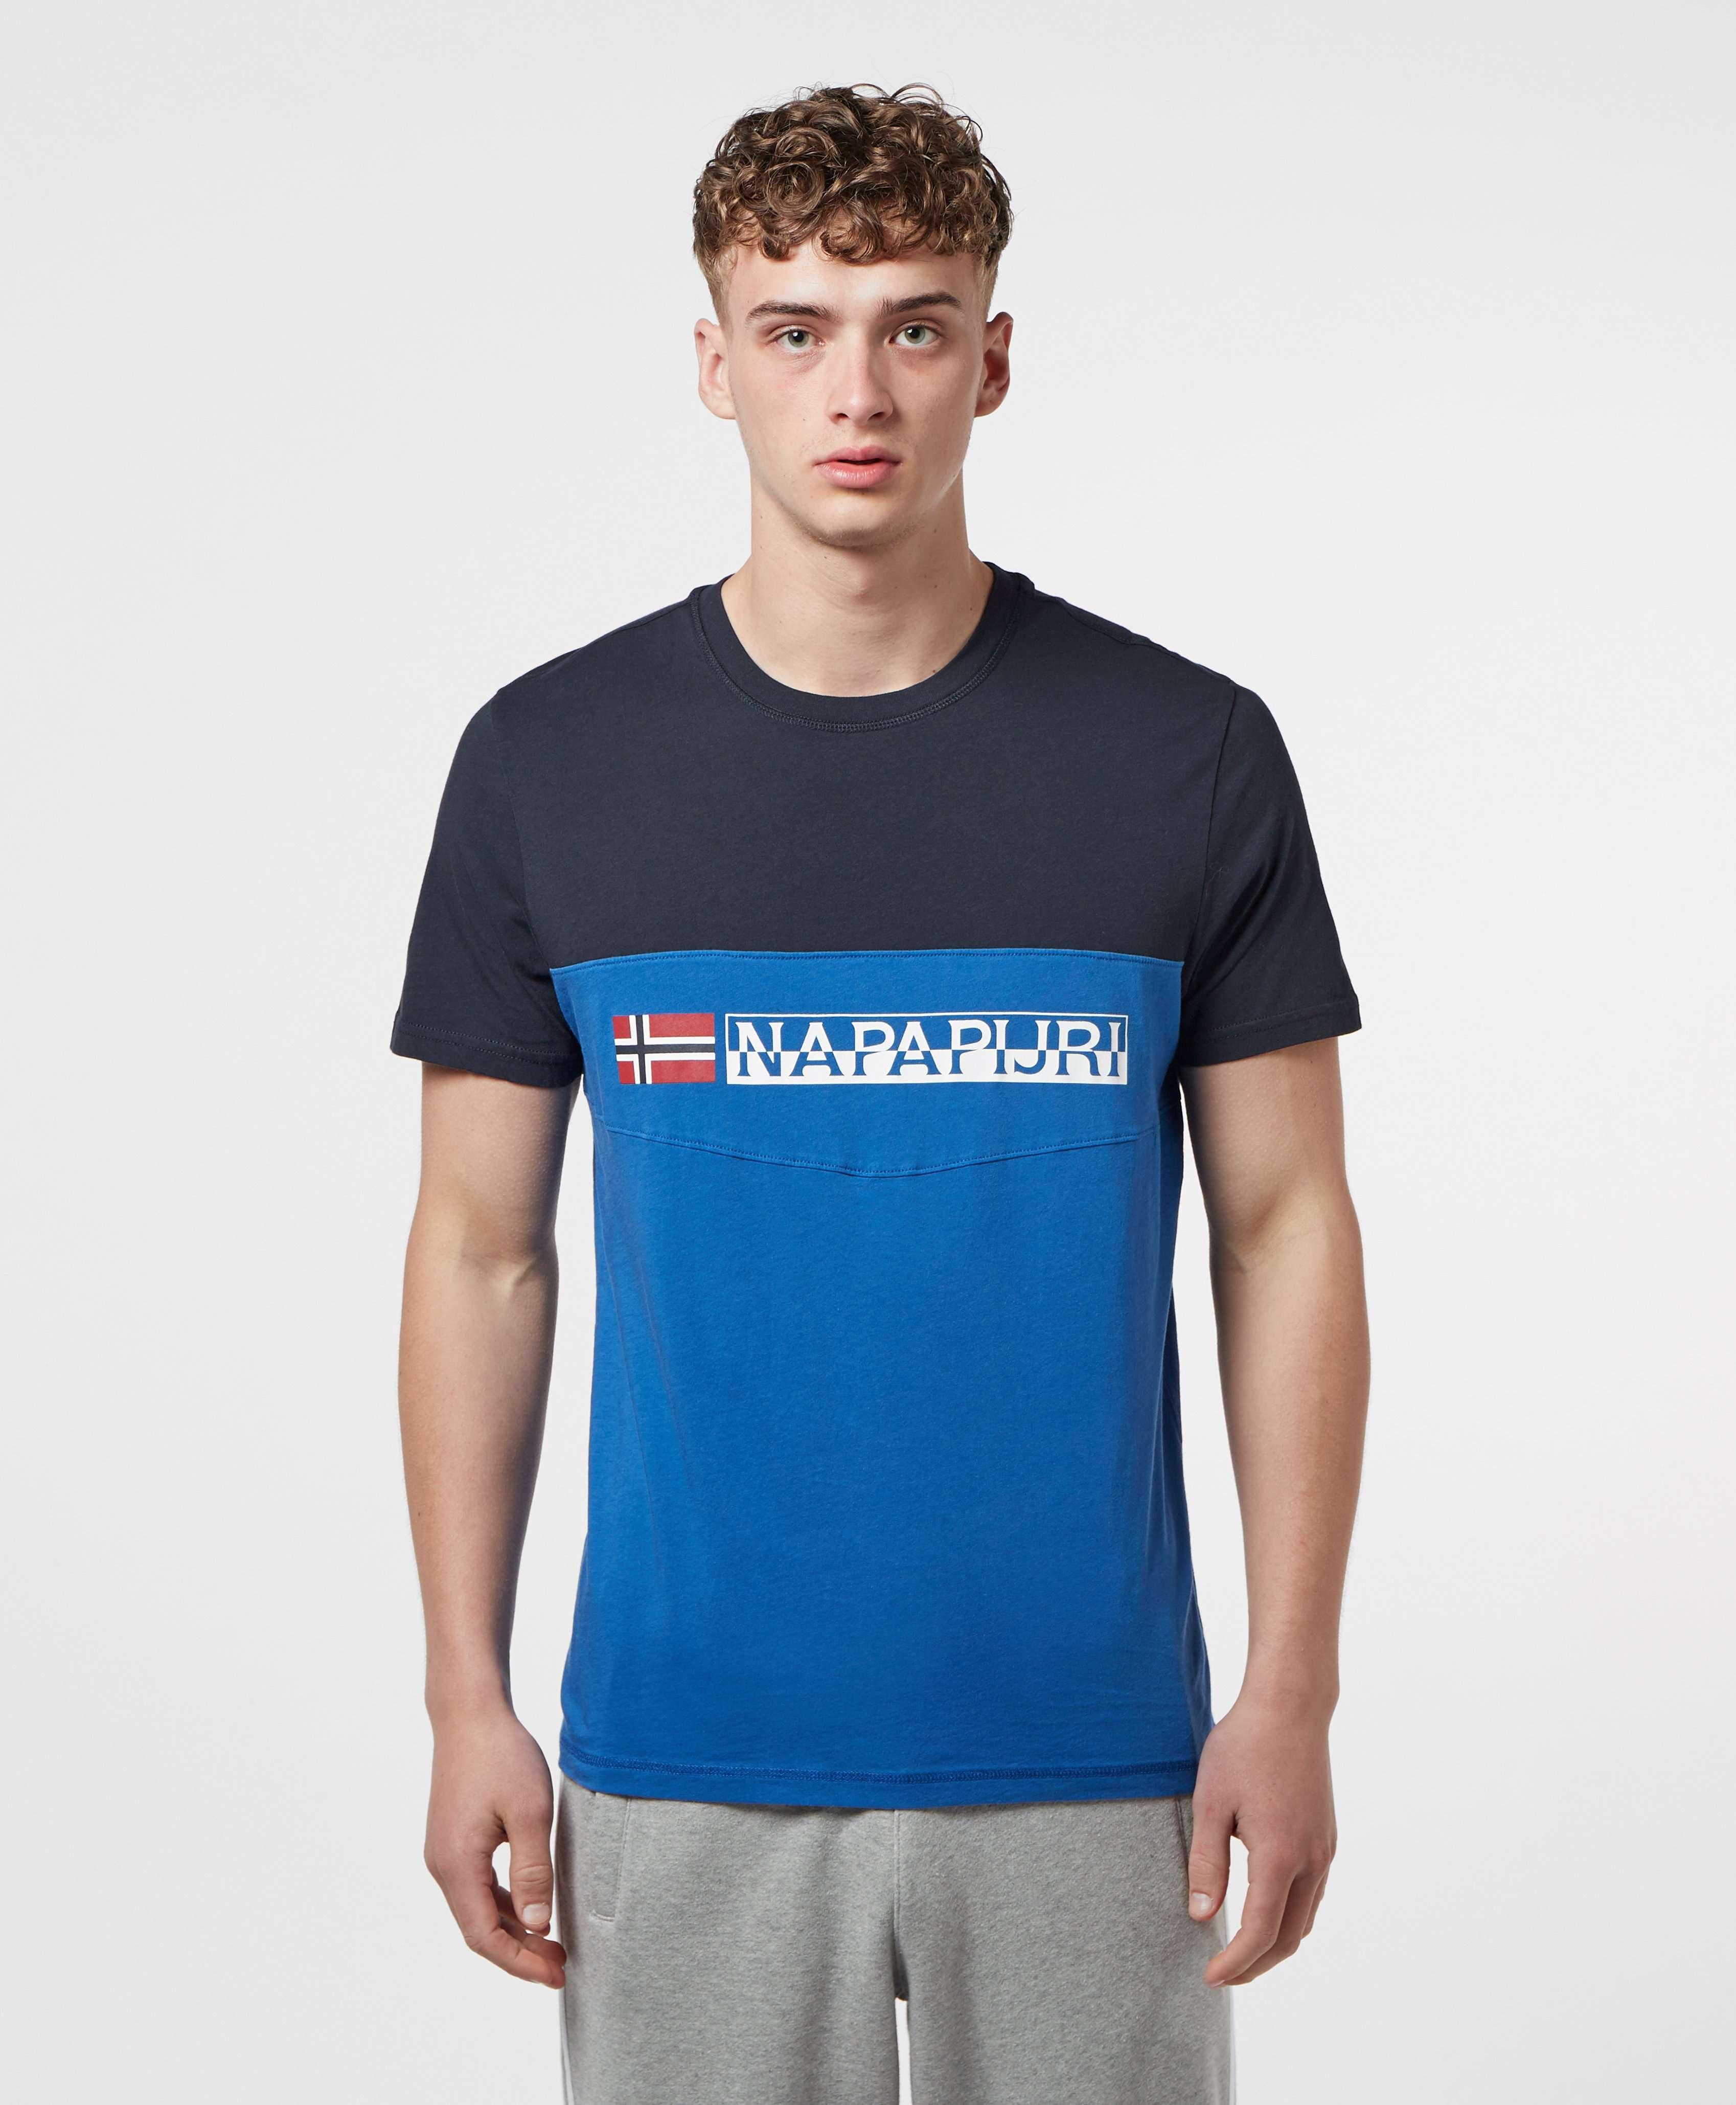 Napapijri Colour Block Skydiver Short Sleeve T-Shirt